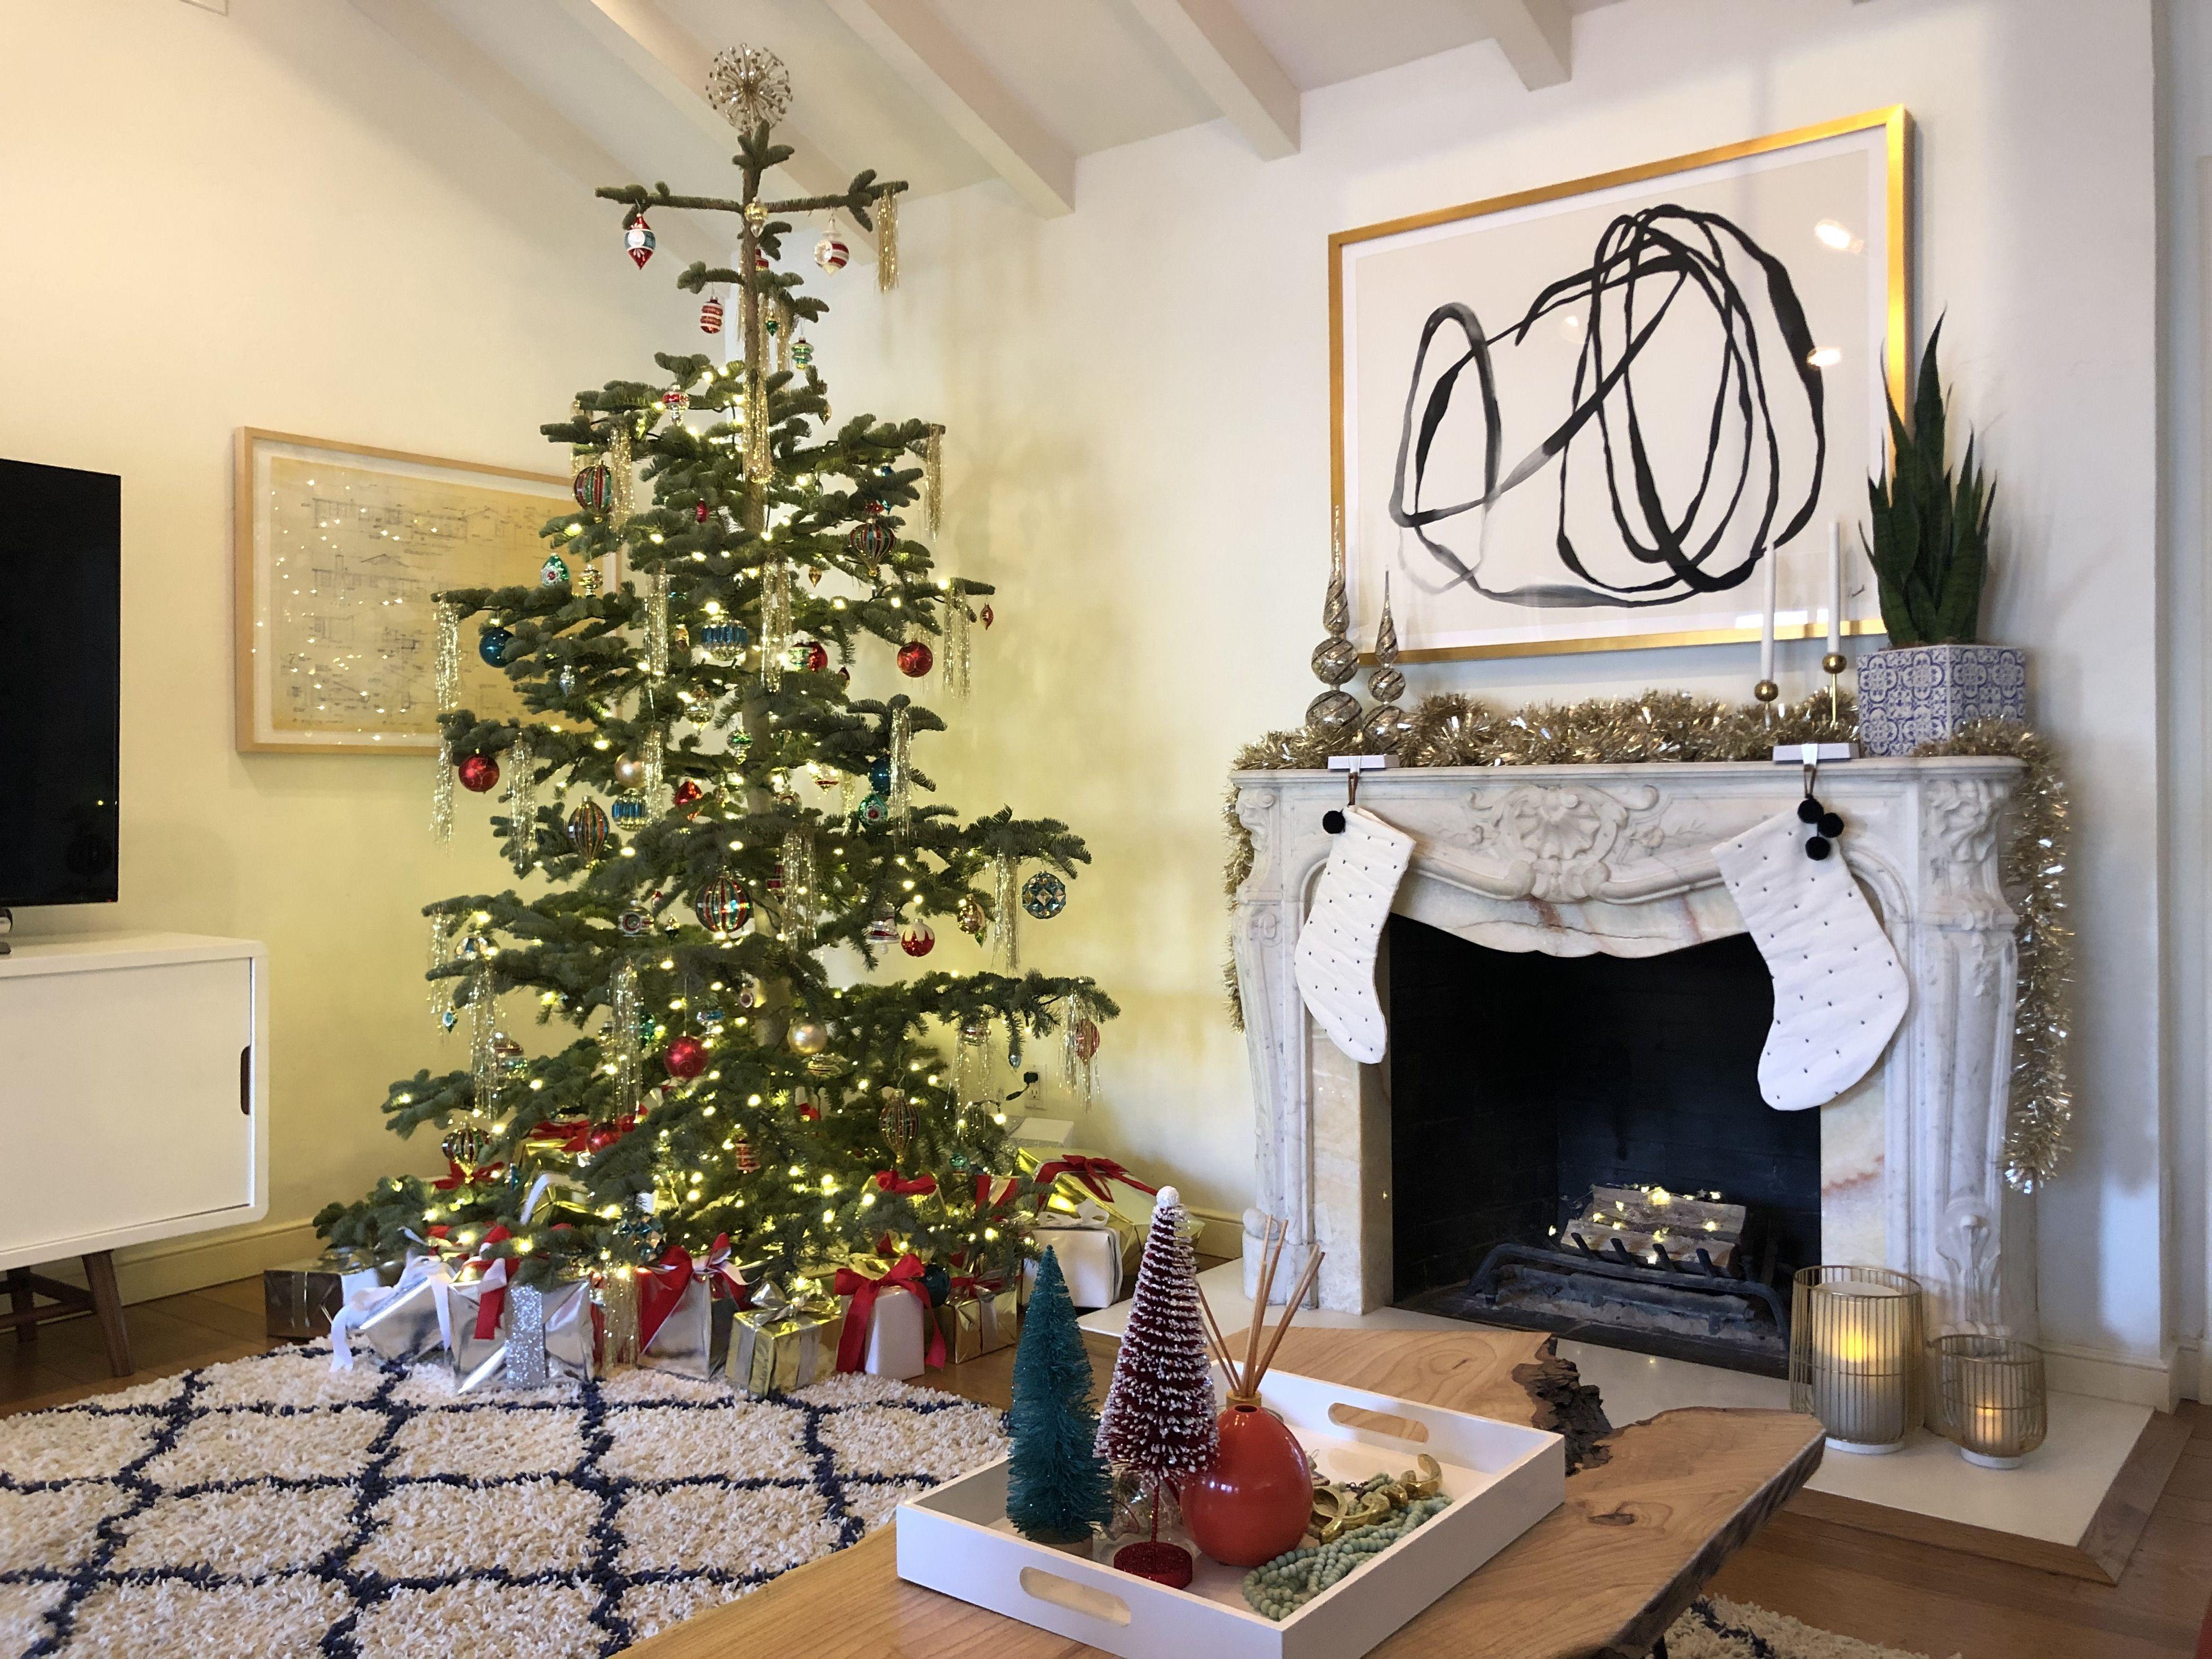 Mid Mod Christmas Decorations Mid Century Modern Christmas Unique Christmas Decorations Modern Christmas Tree